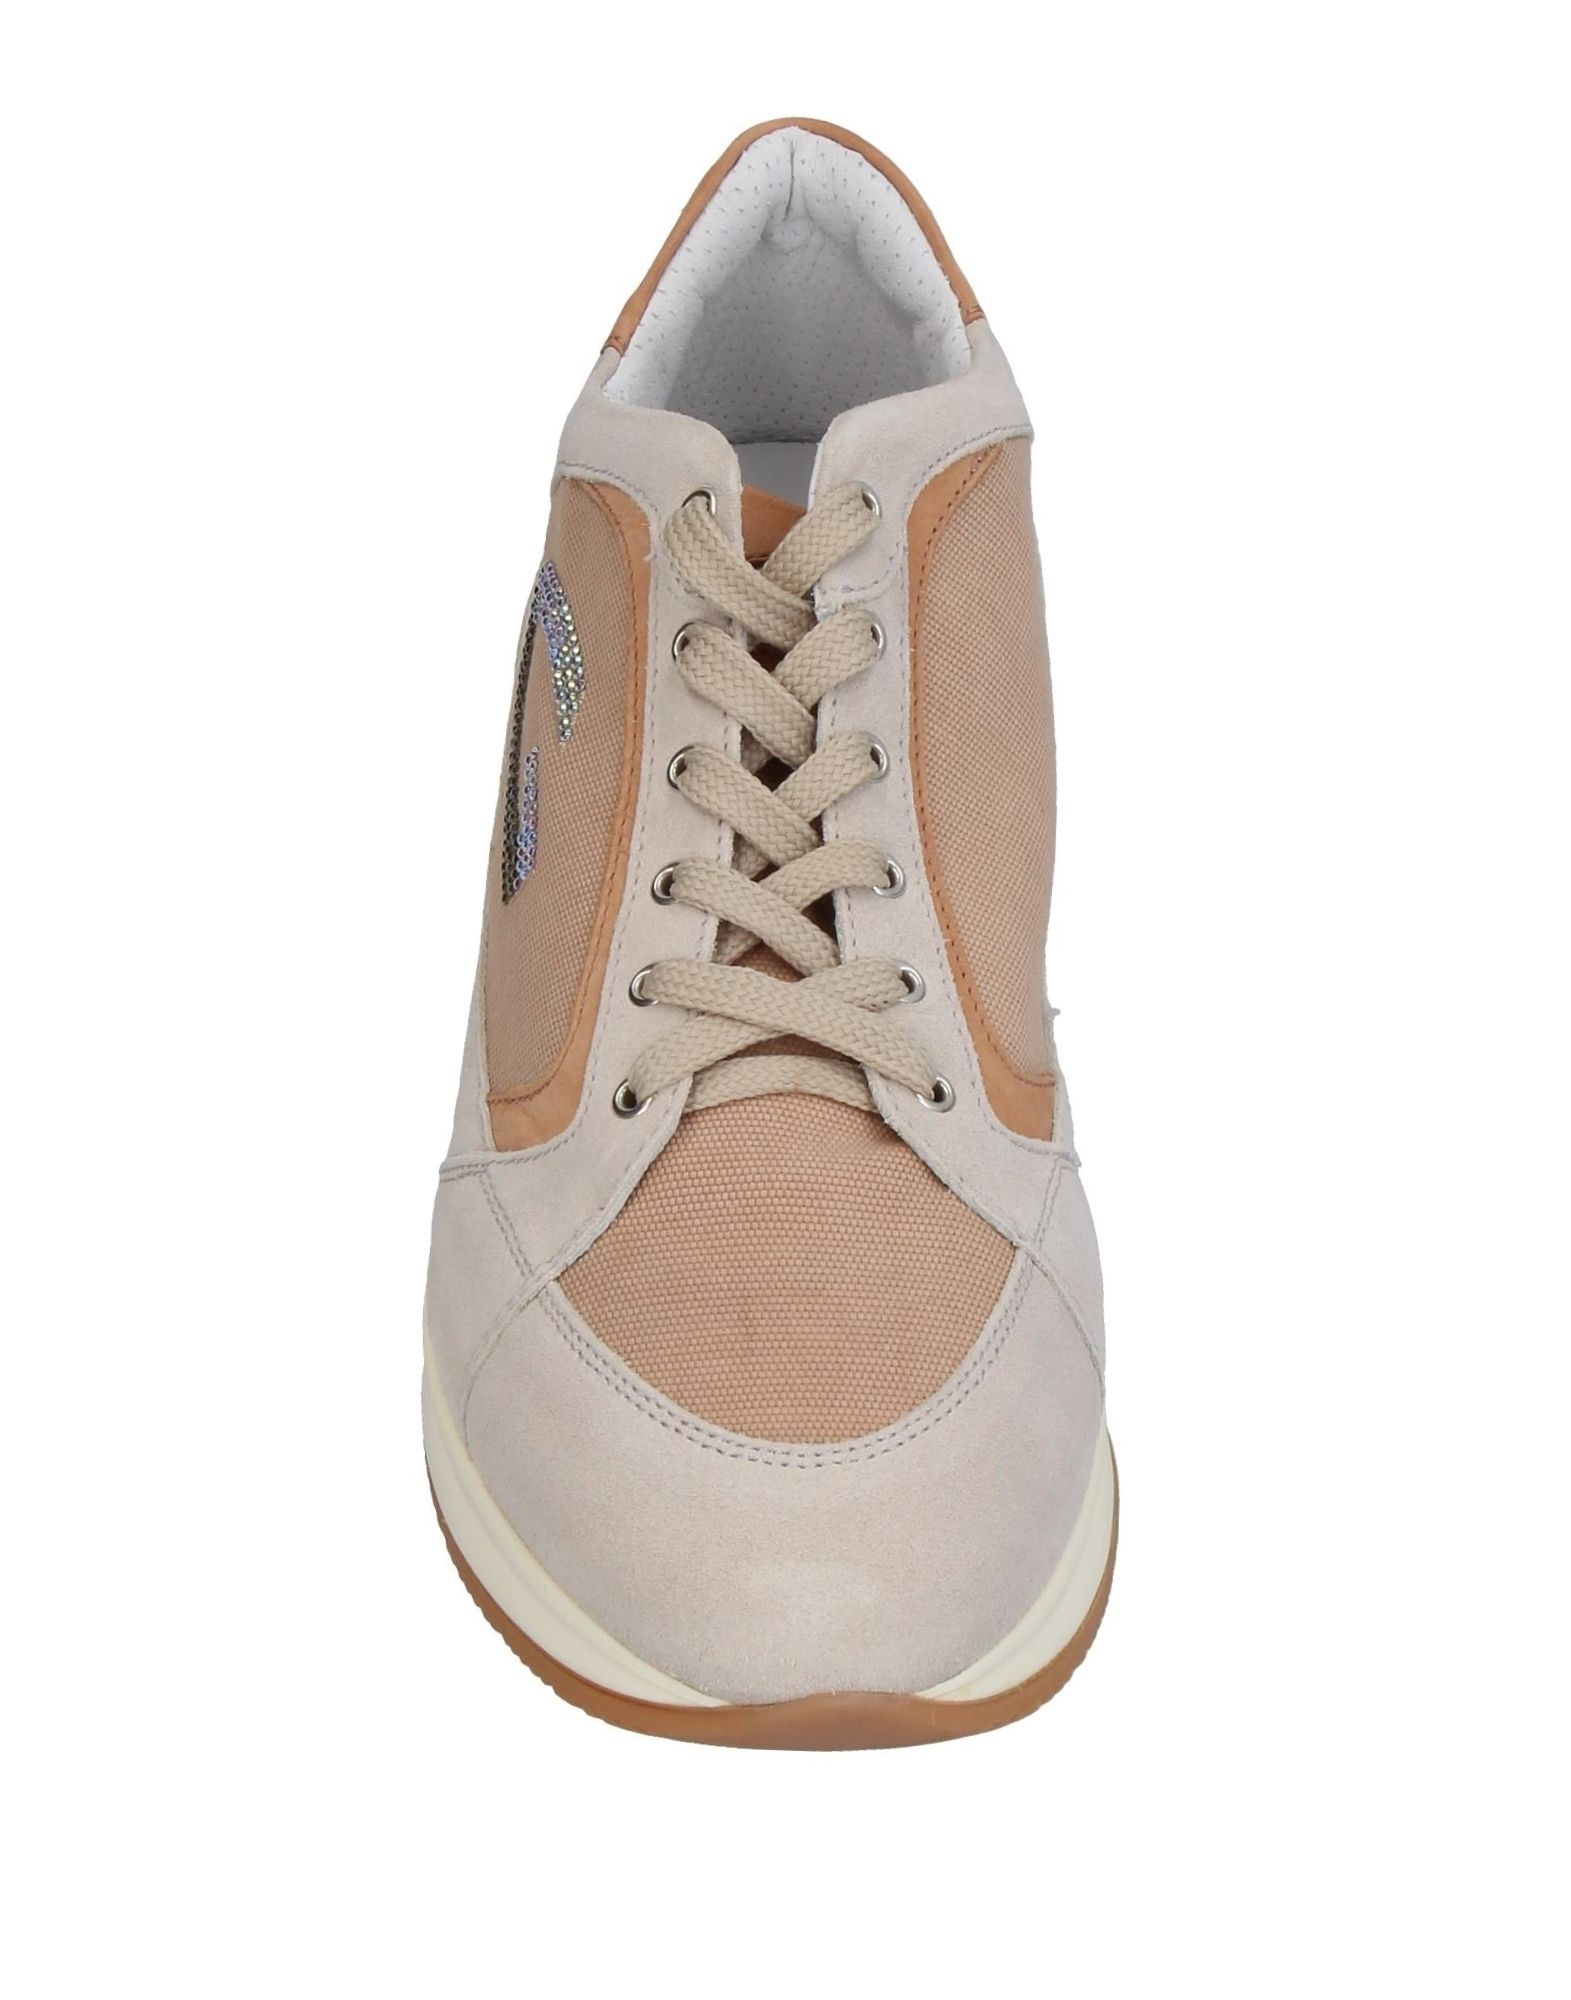 Alberto Guardiani Sneakers Damen  11407990RC Gute Qualität beliebte Schuhe